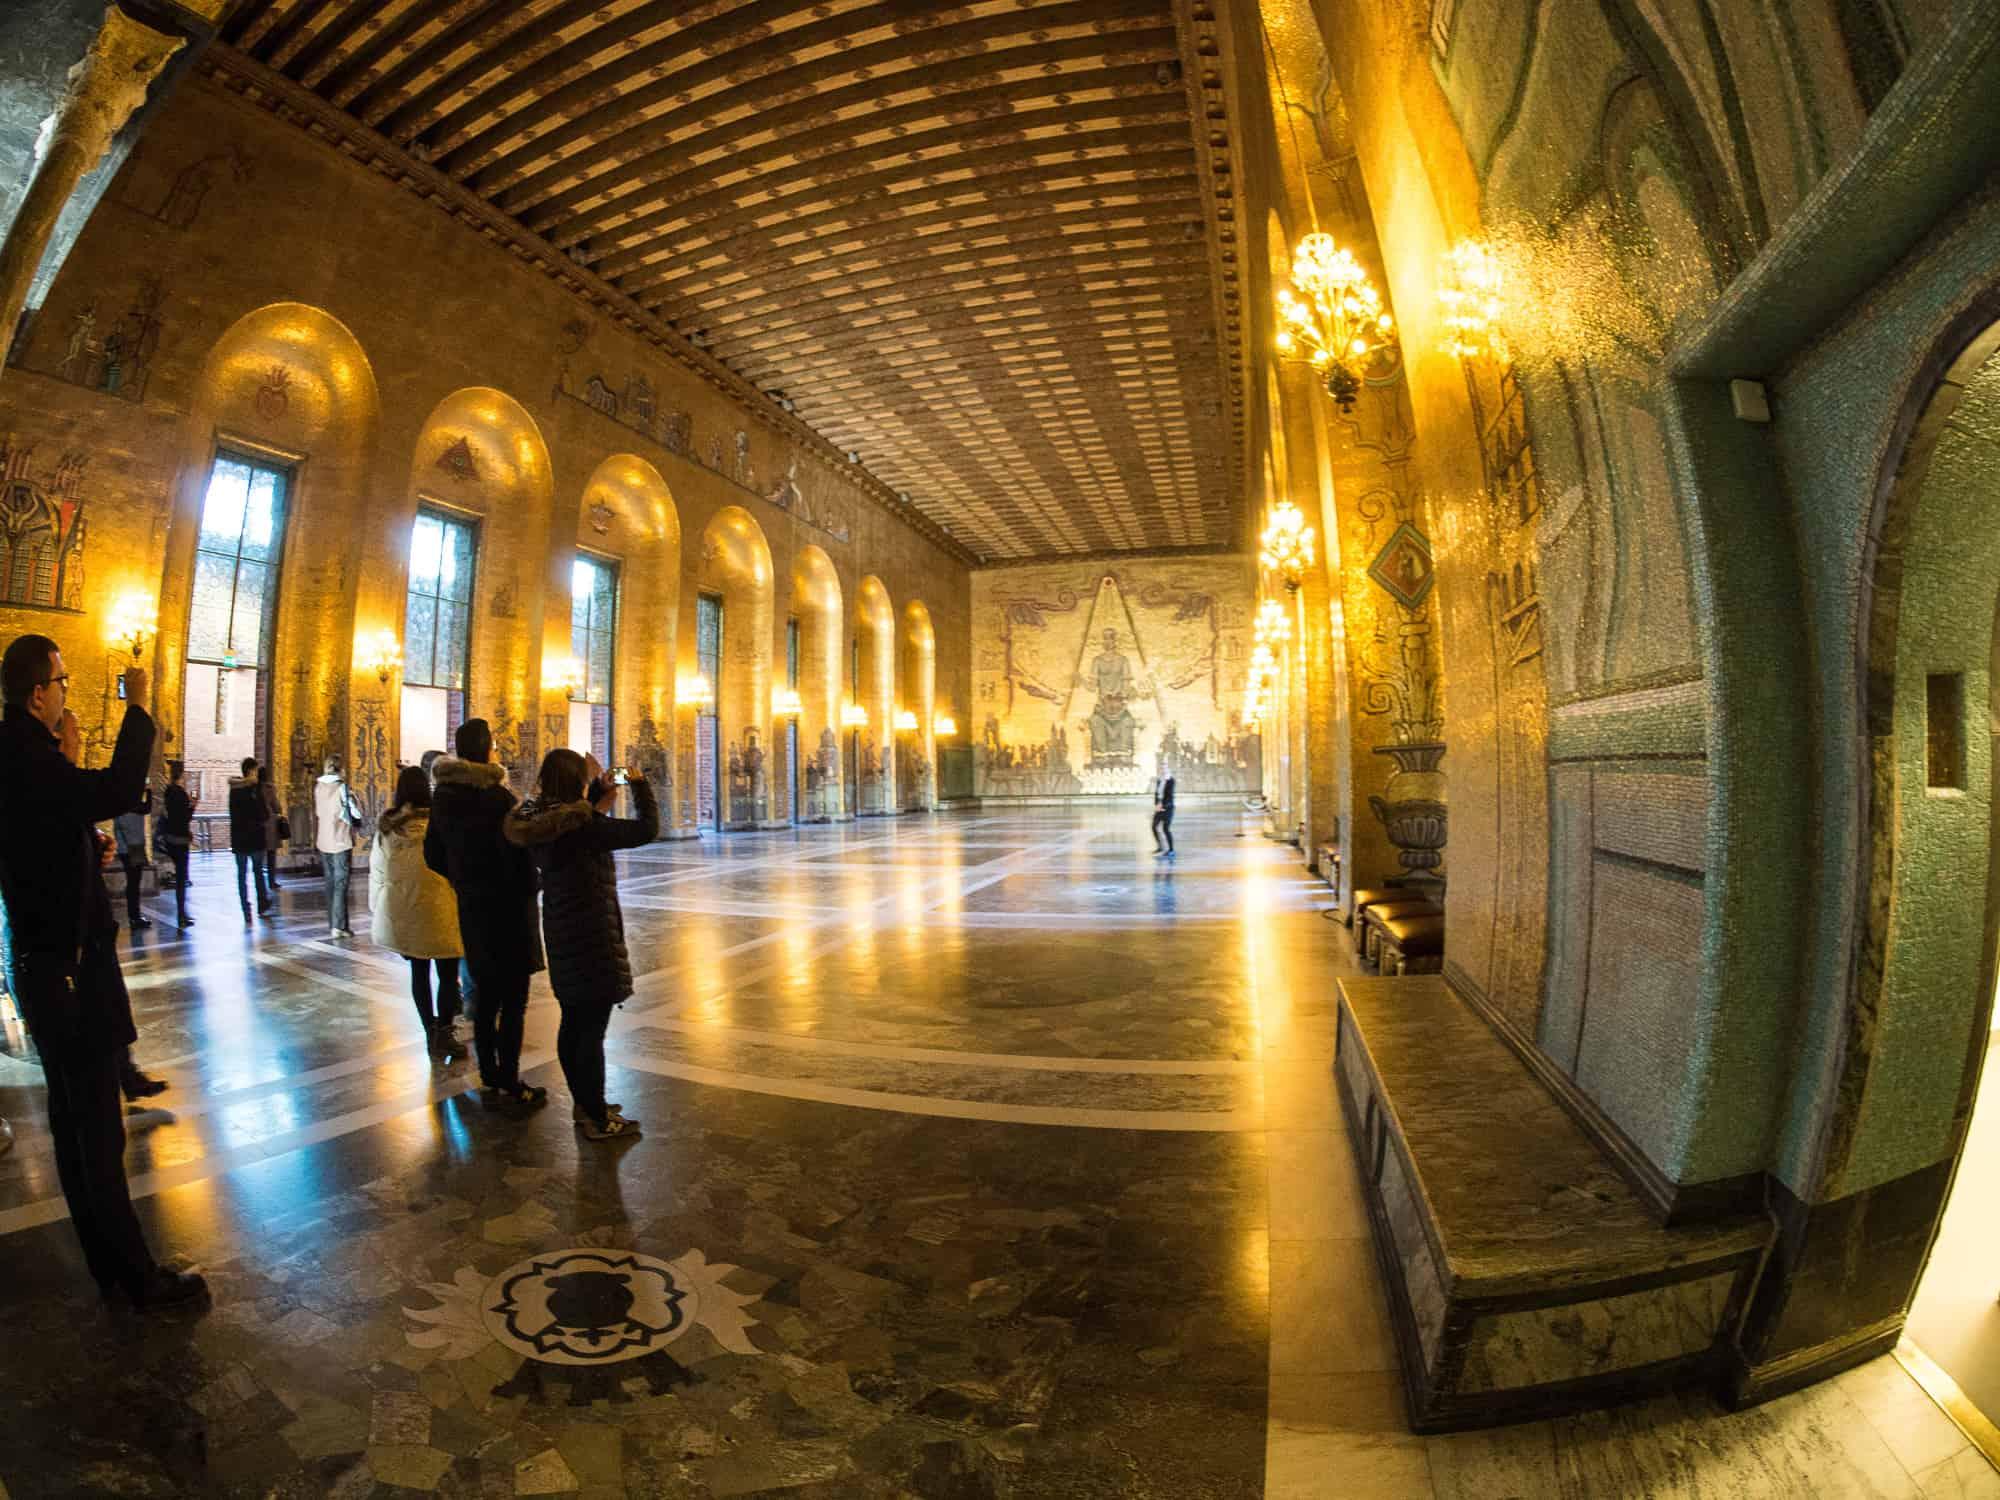 Goldener Saal im Stadshuset, Rathaus in Stockholm